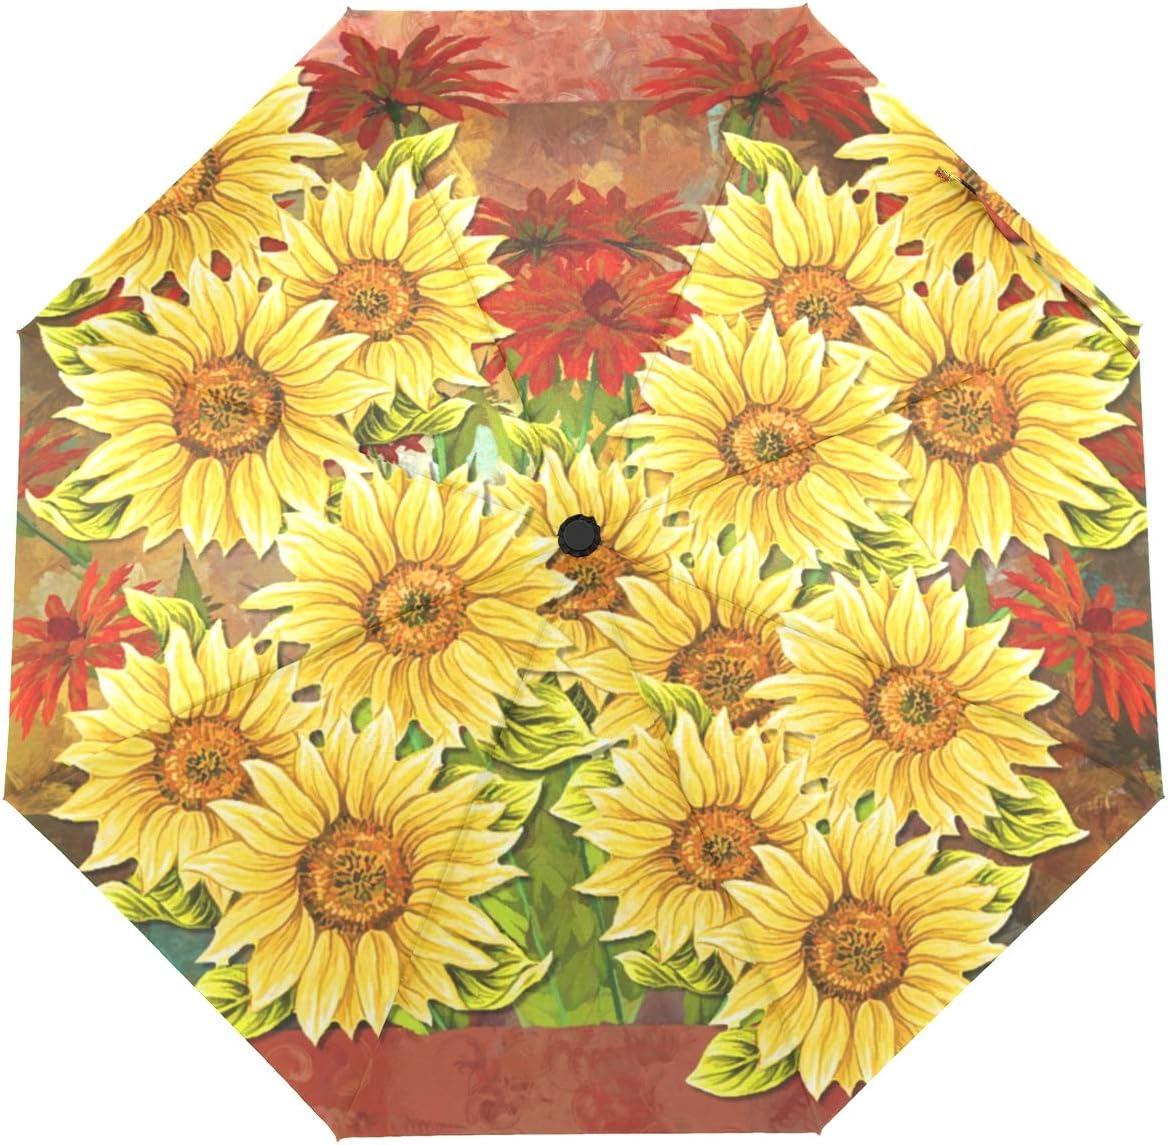 Direct stock discount OREZI Automatic Open Close Max 58% OFF Umbrella Folding Painting Sunflowers